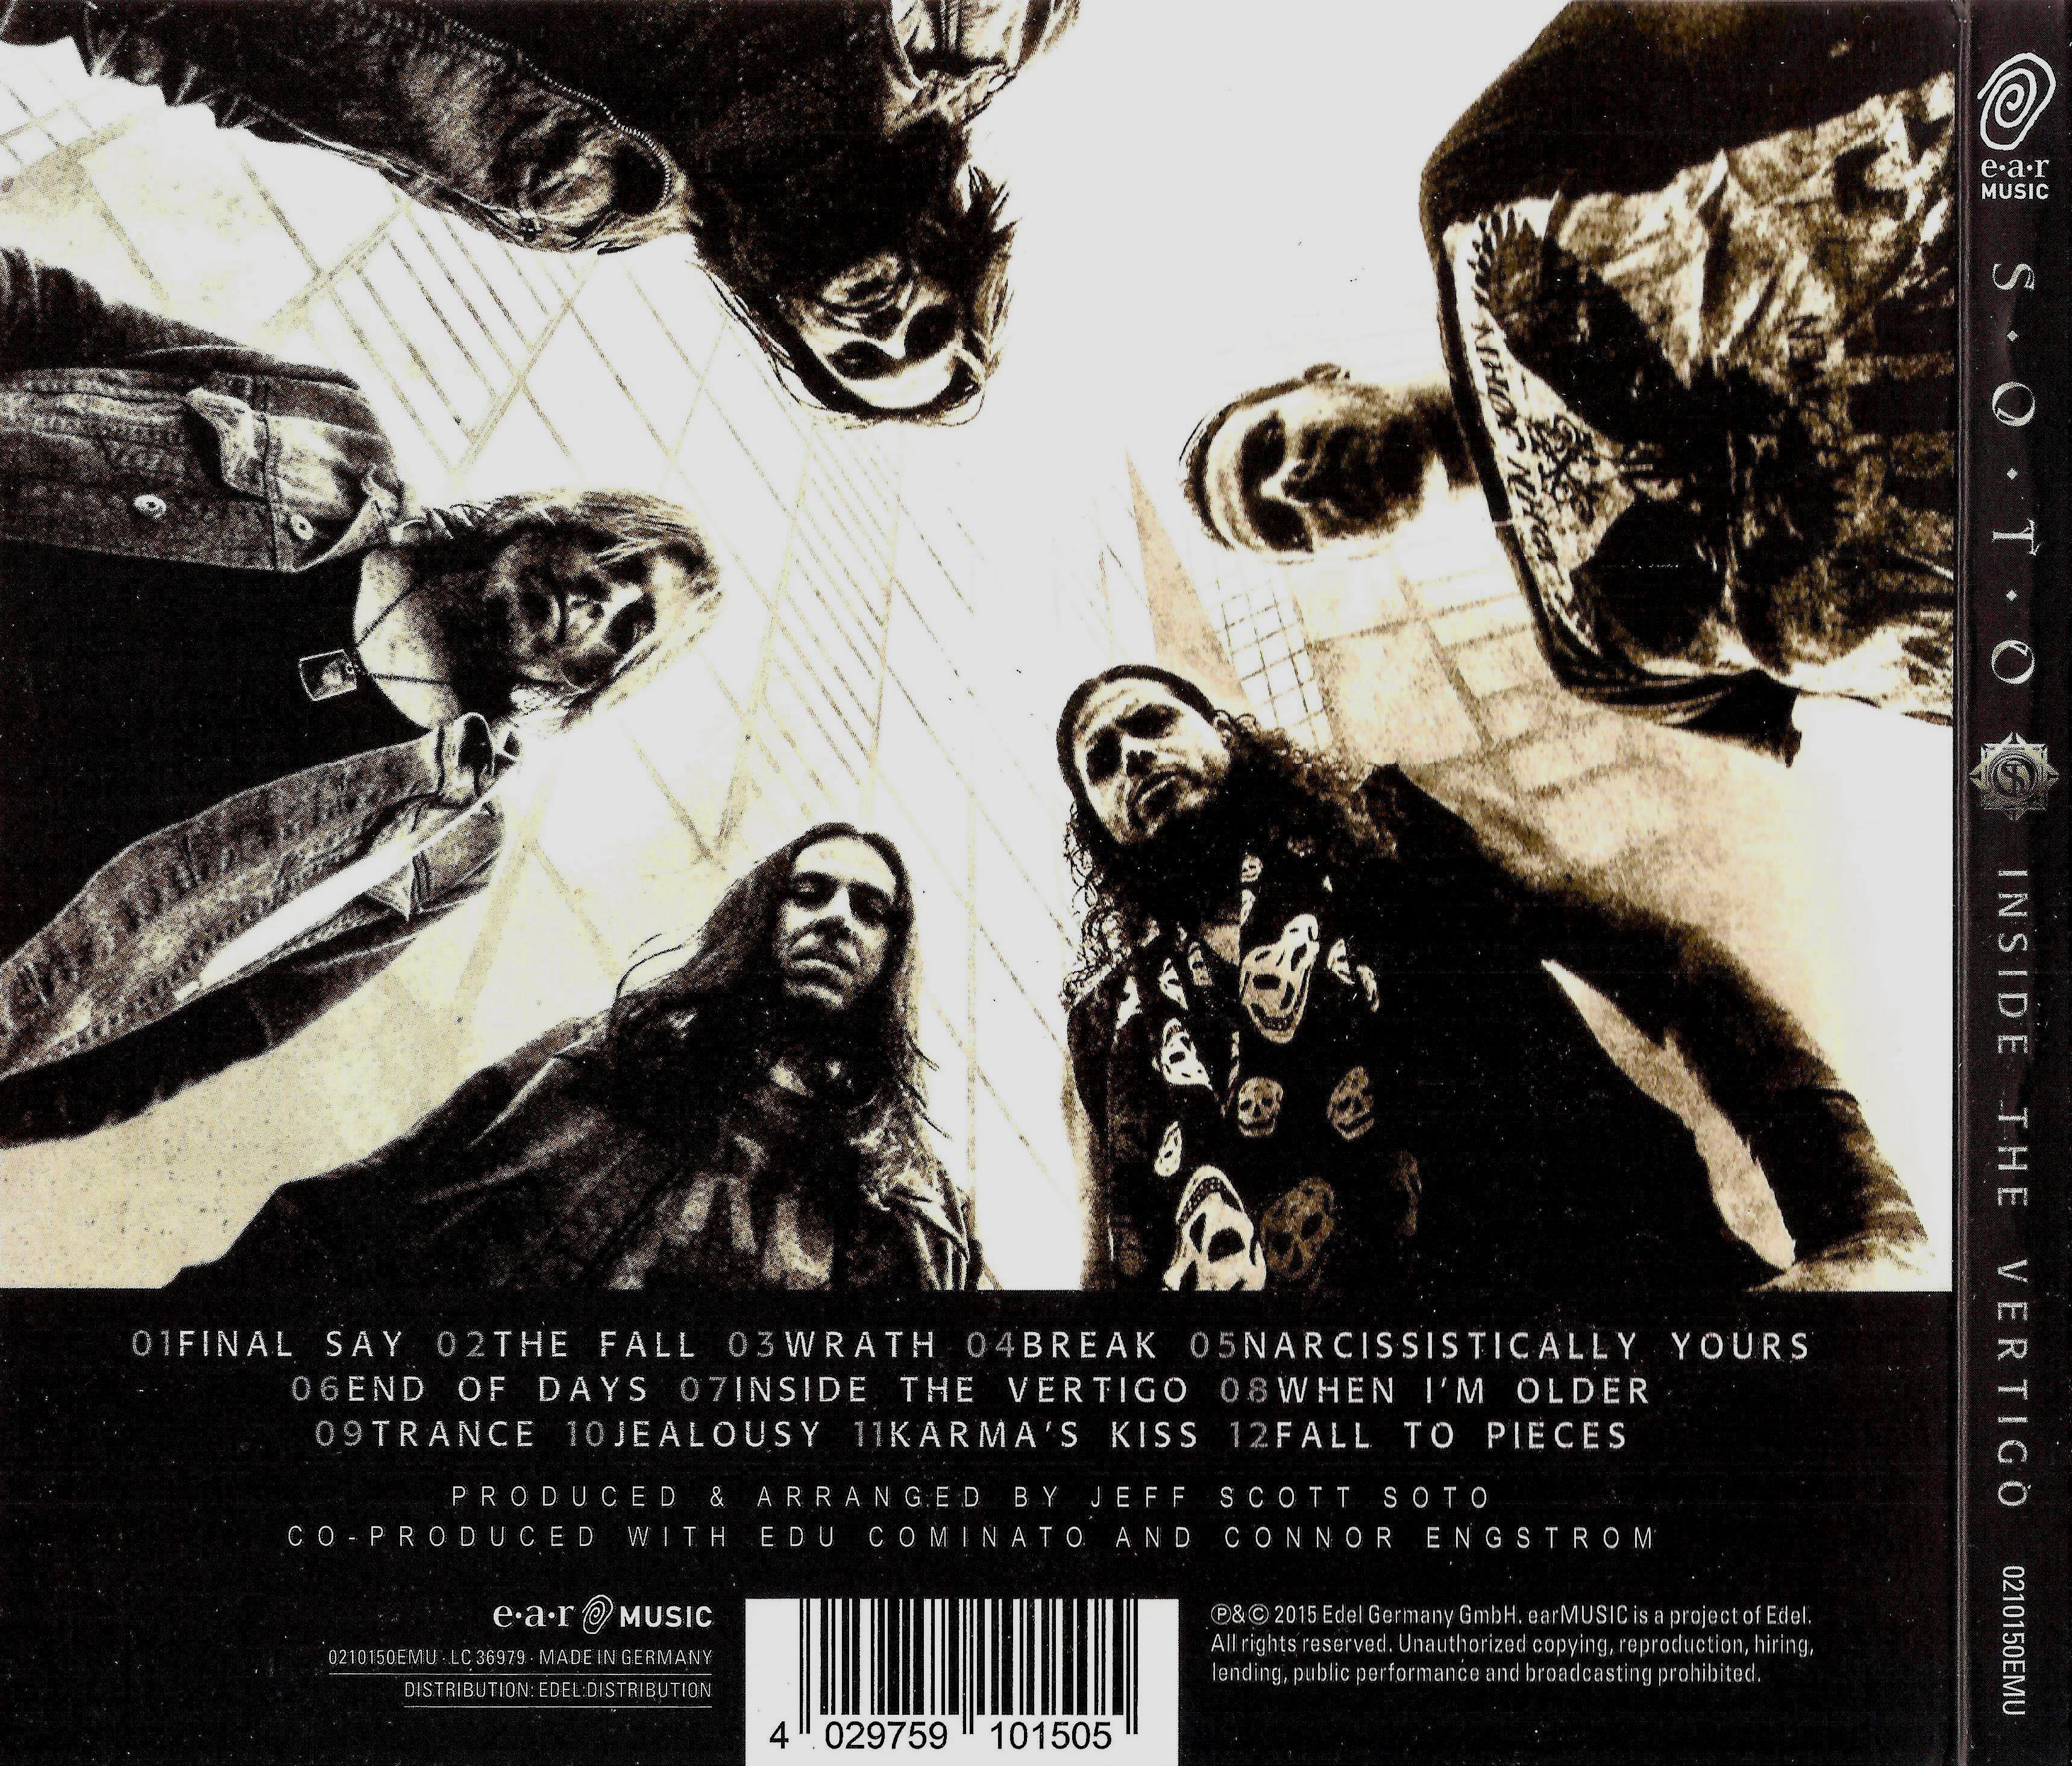 COVERS BOX SK ::: S O T O (Jeff Scott Soto) - Inside The